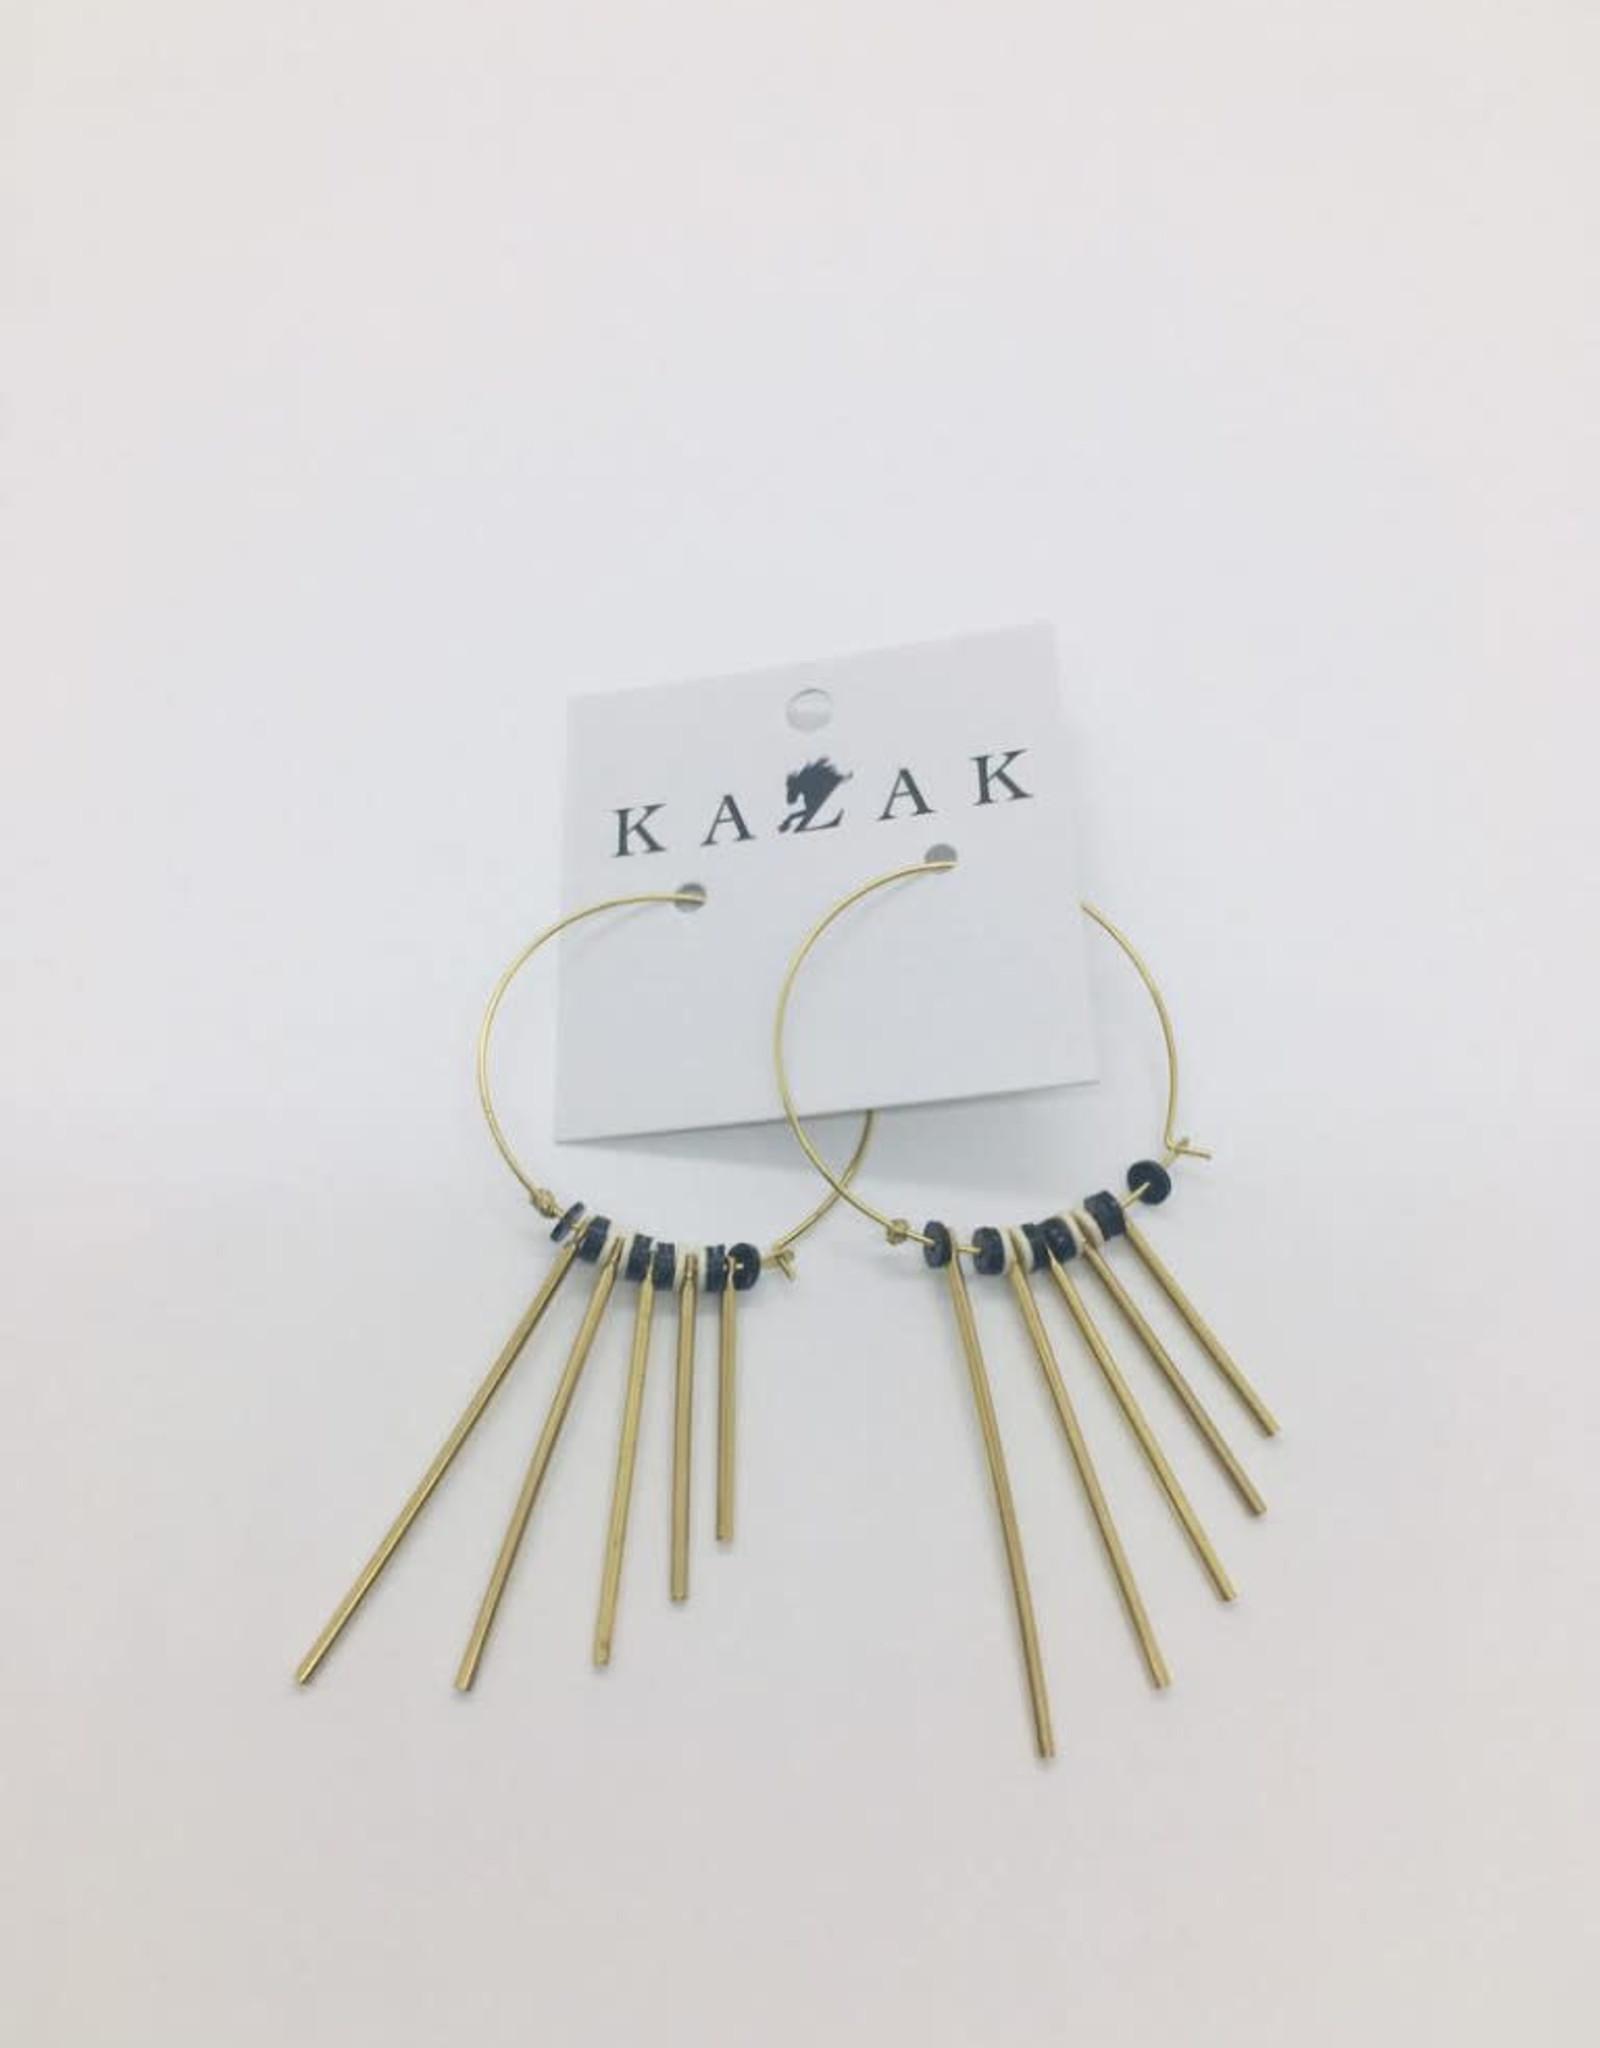 Kazak Boucles d'oreilles Bolzano PE20 Kazak Noir et crème